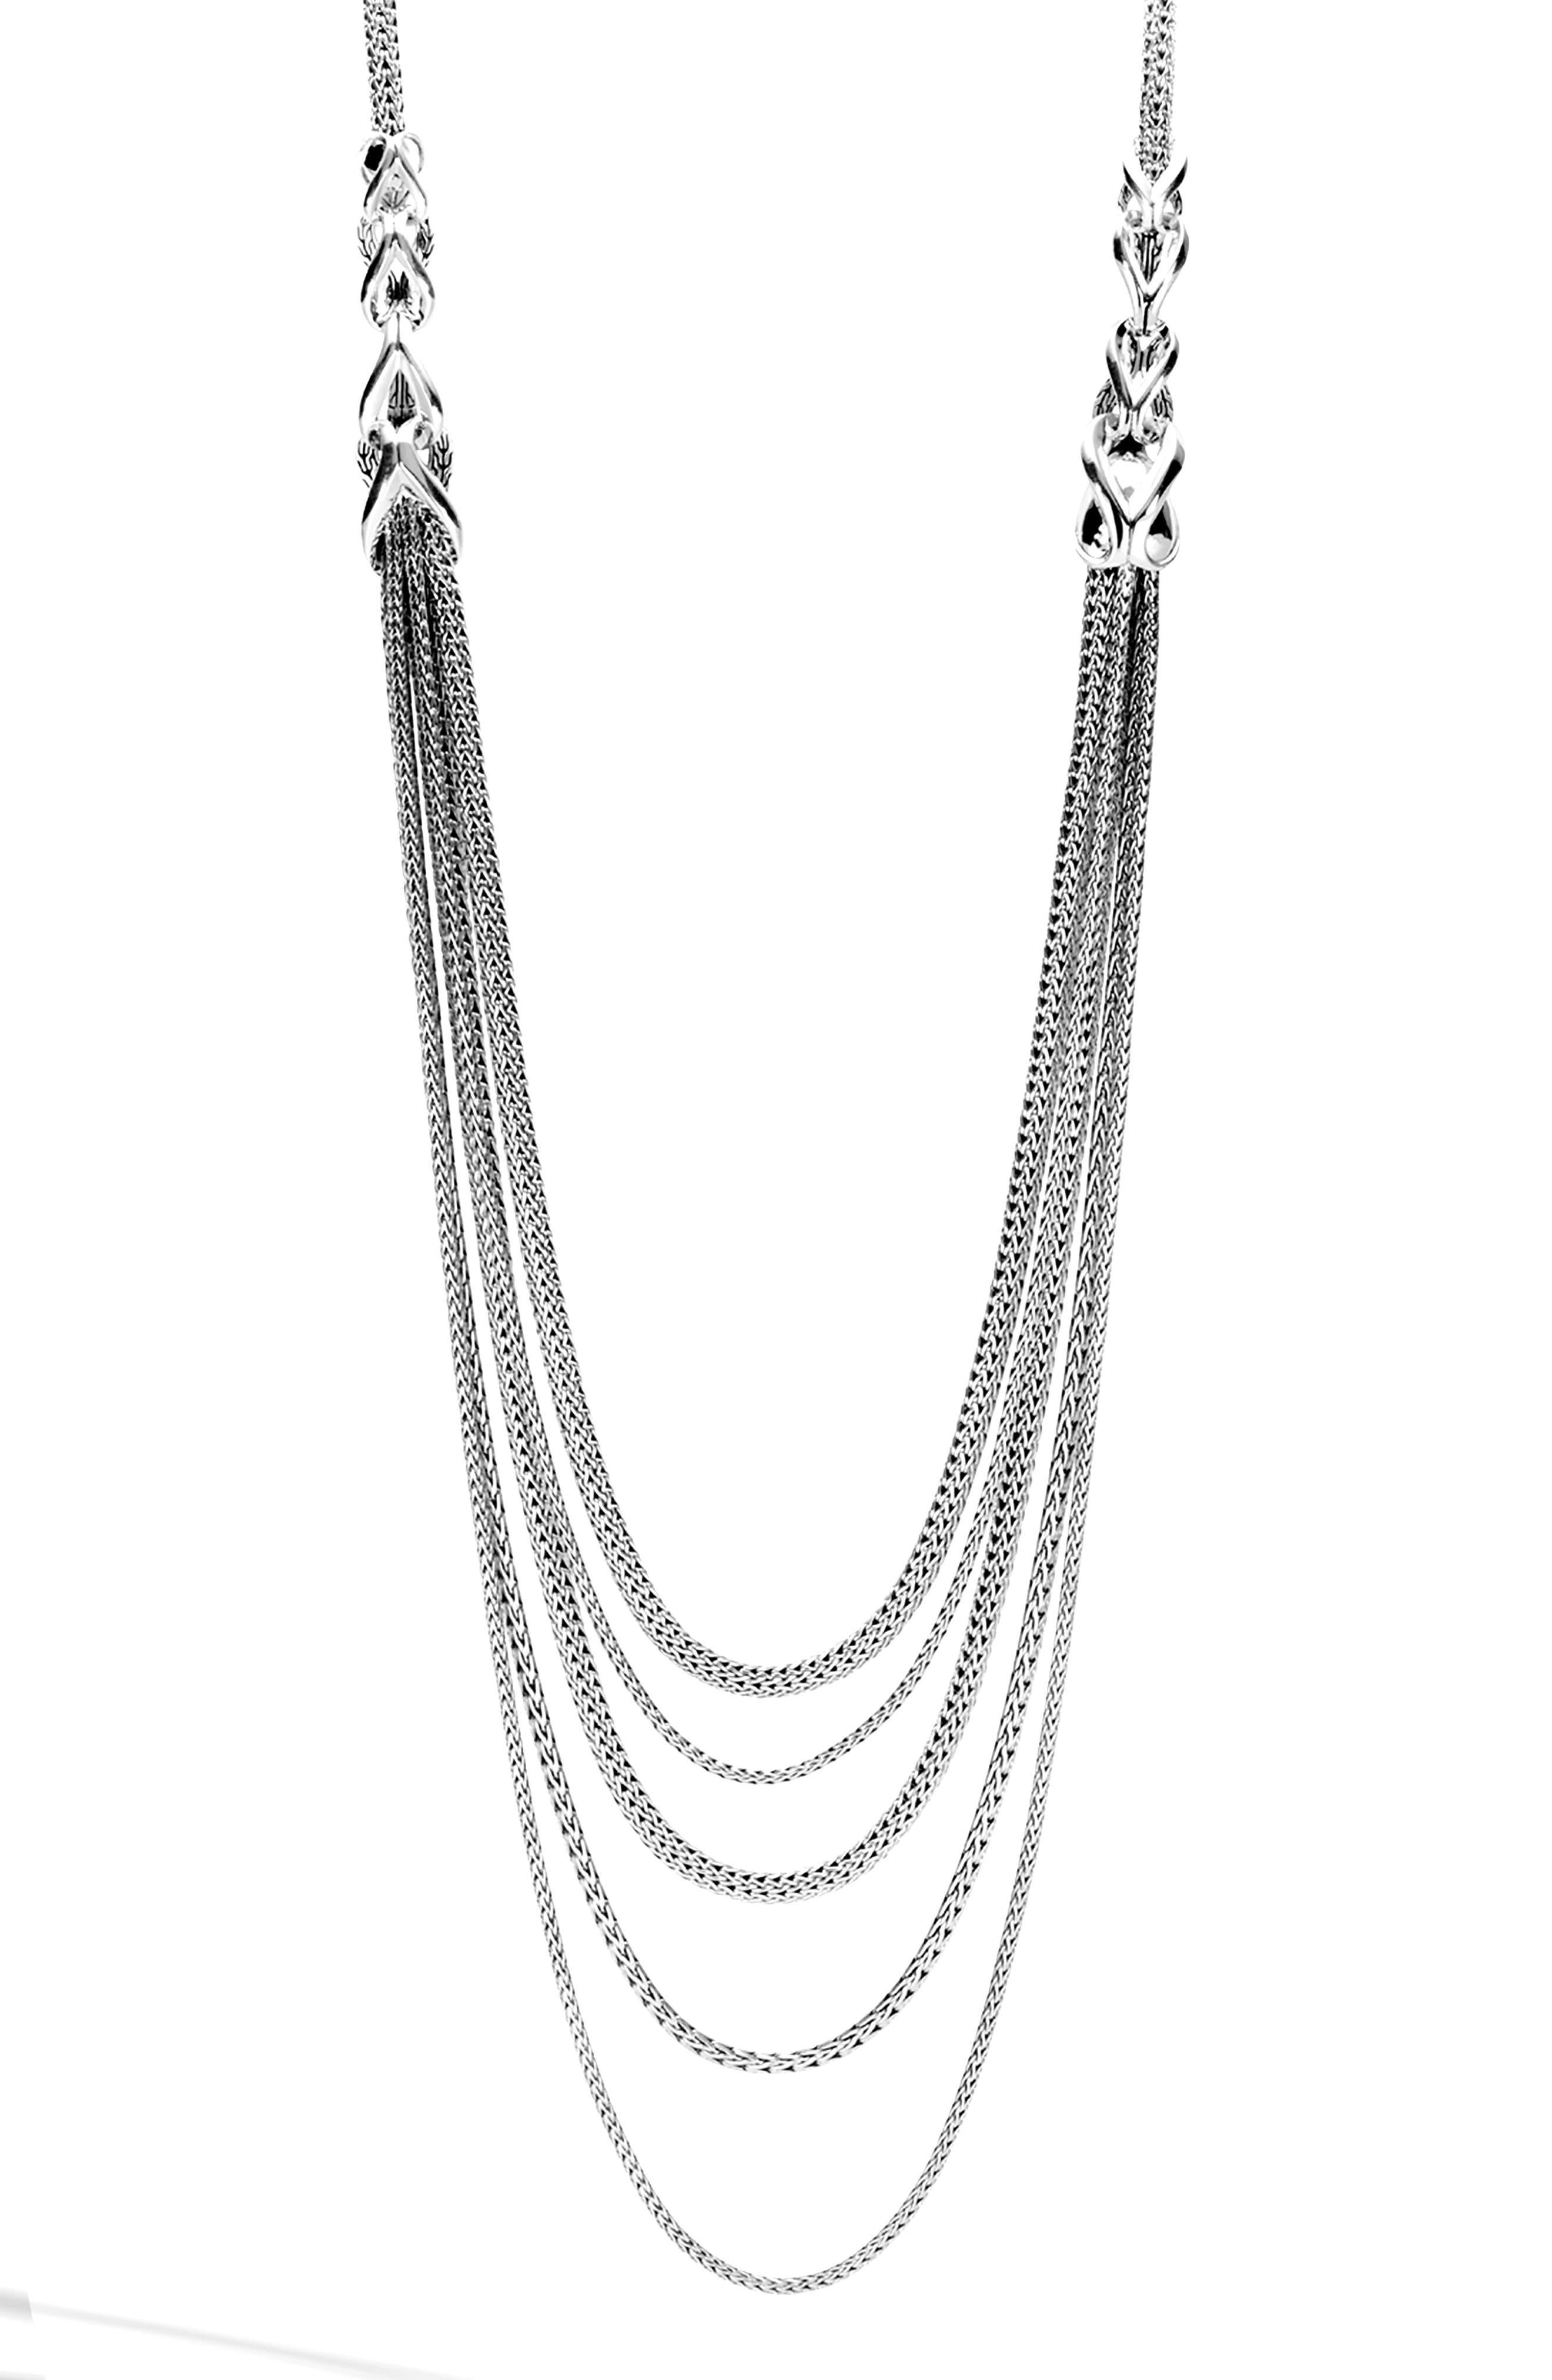 Asli Classic Chain Link Bib Necklace,                             Main thumbnail 1, color,                             SILVER